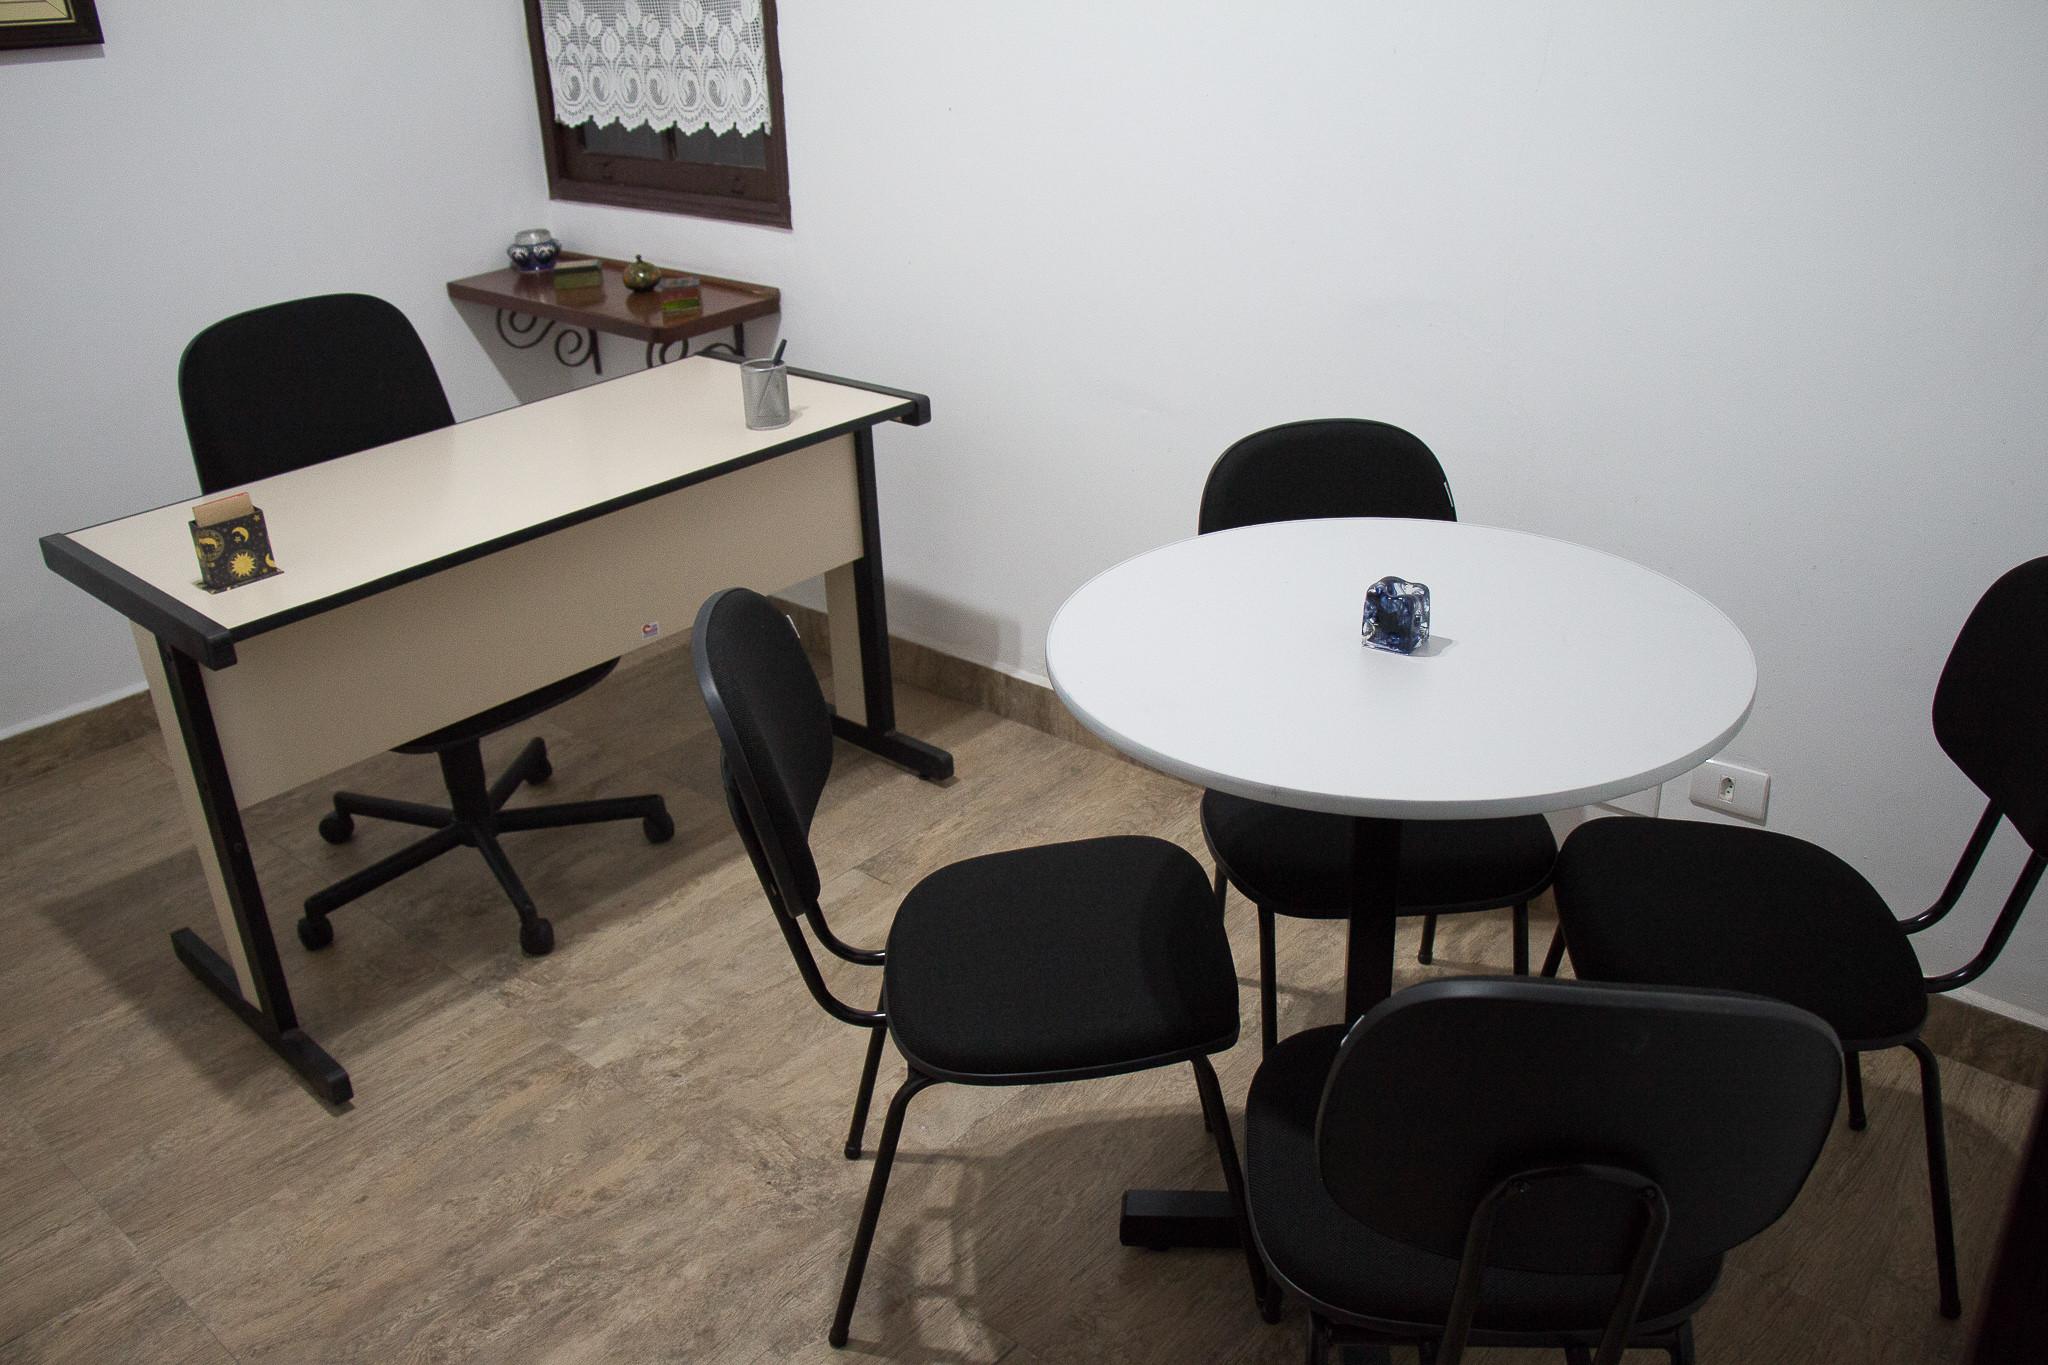 Sala 2 - Trabalho individual